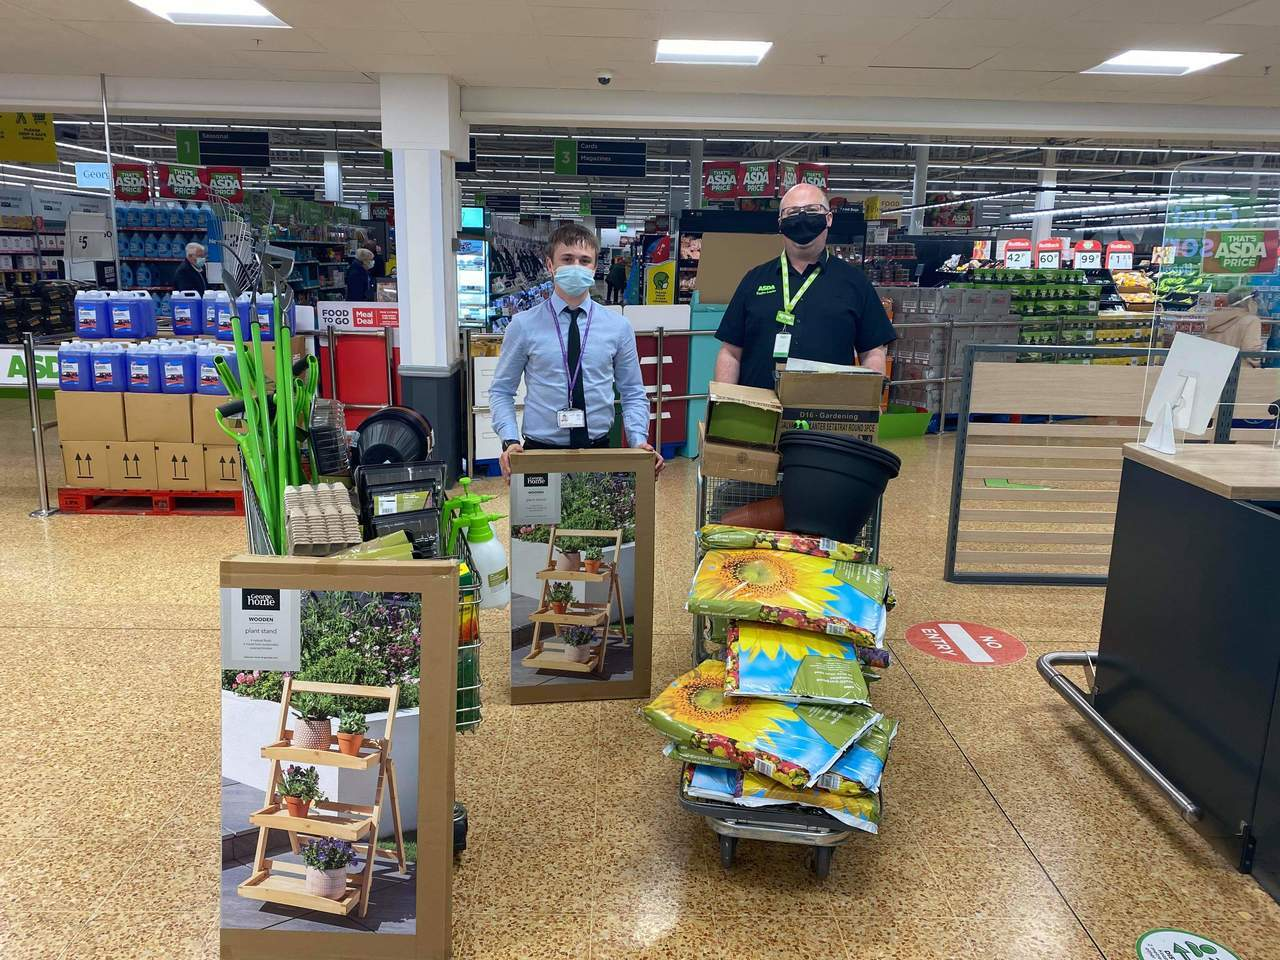 A Big Thank You to The Asda Foundation for their grant to purchase gardening items for Taunton Academy Gardening Club | Asda Taunton